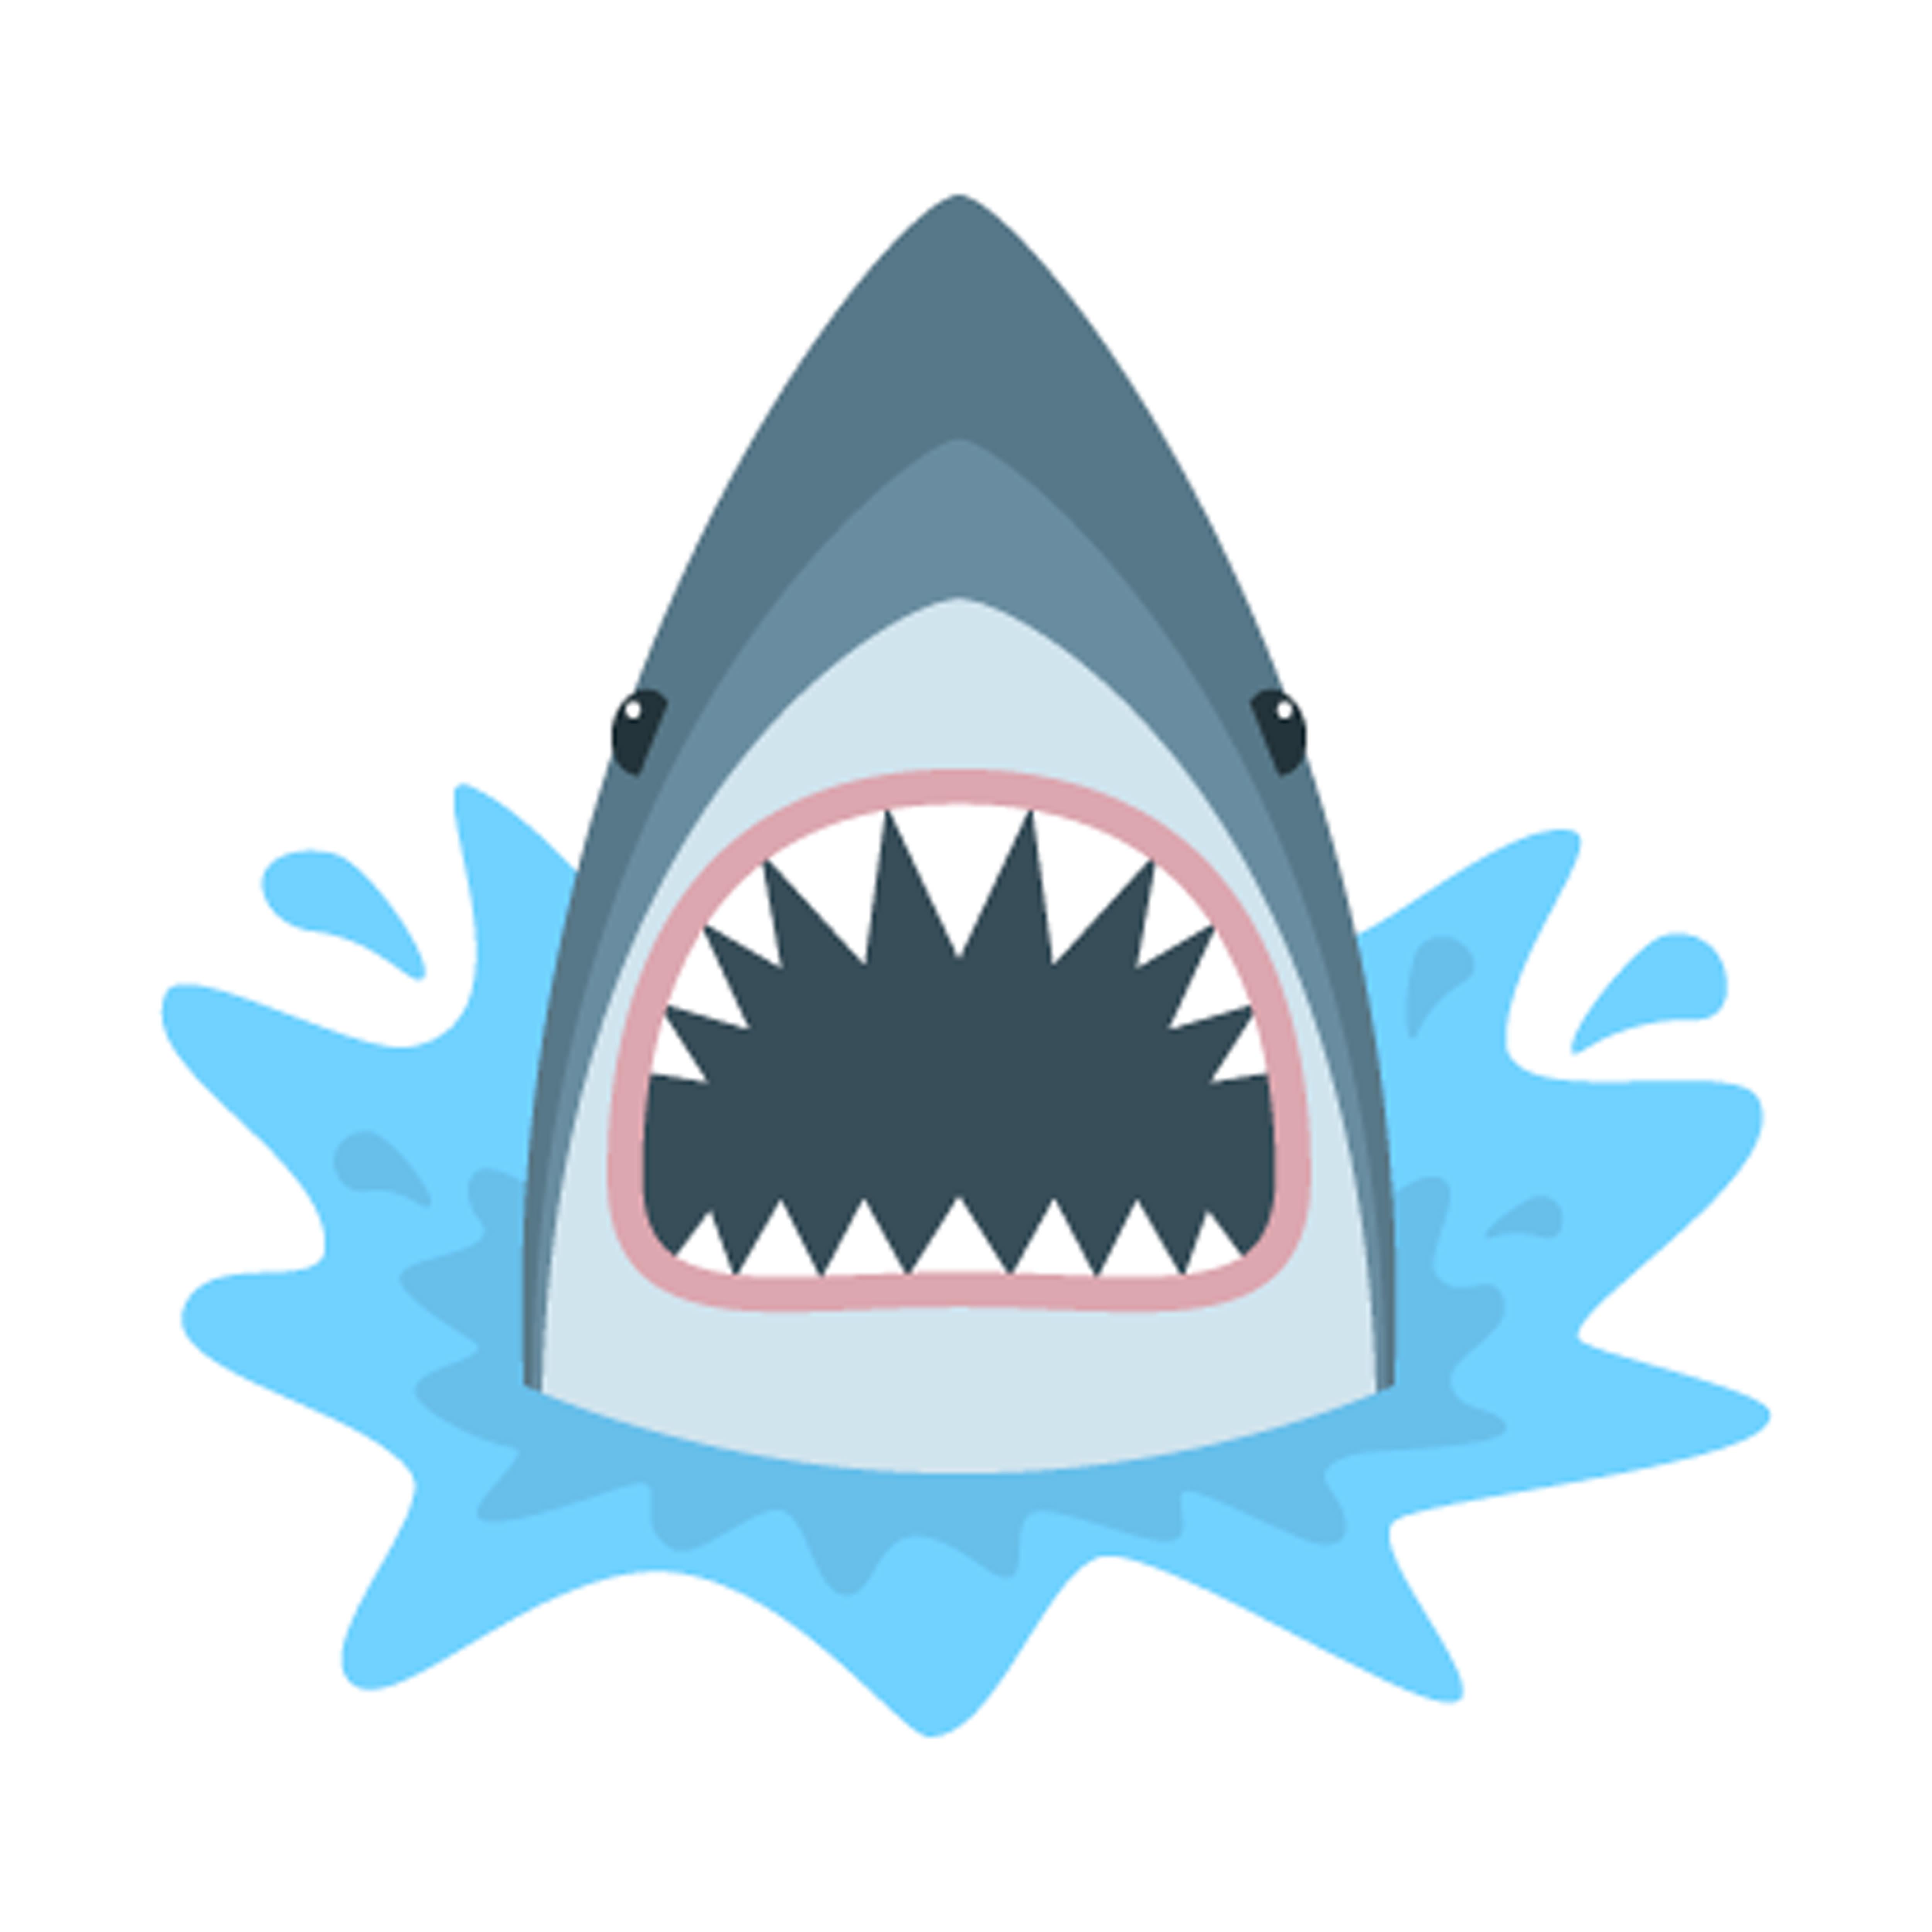 Shark image erlkoj